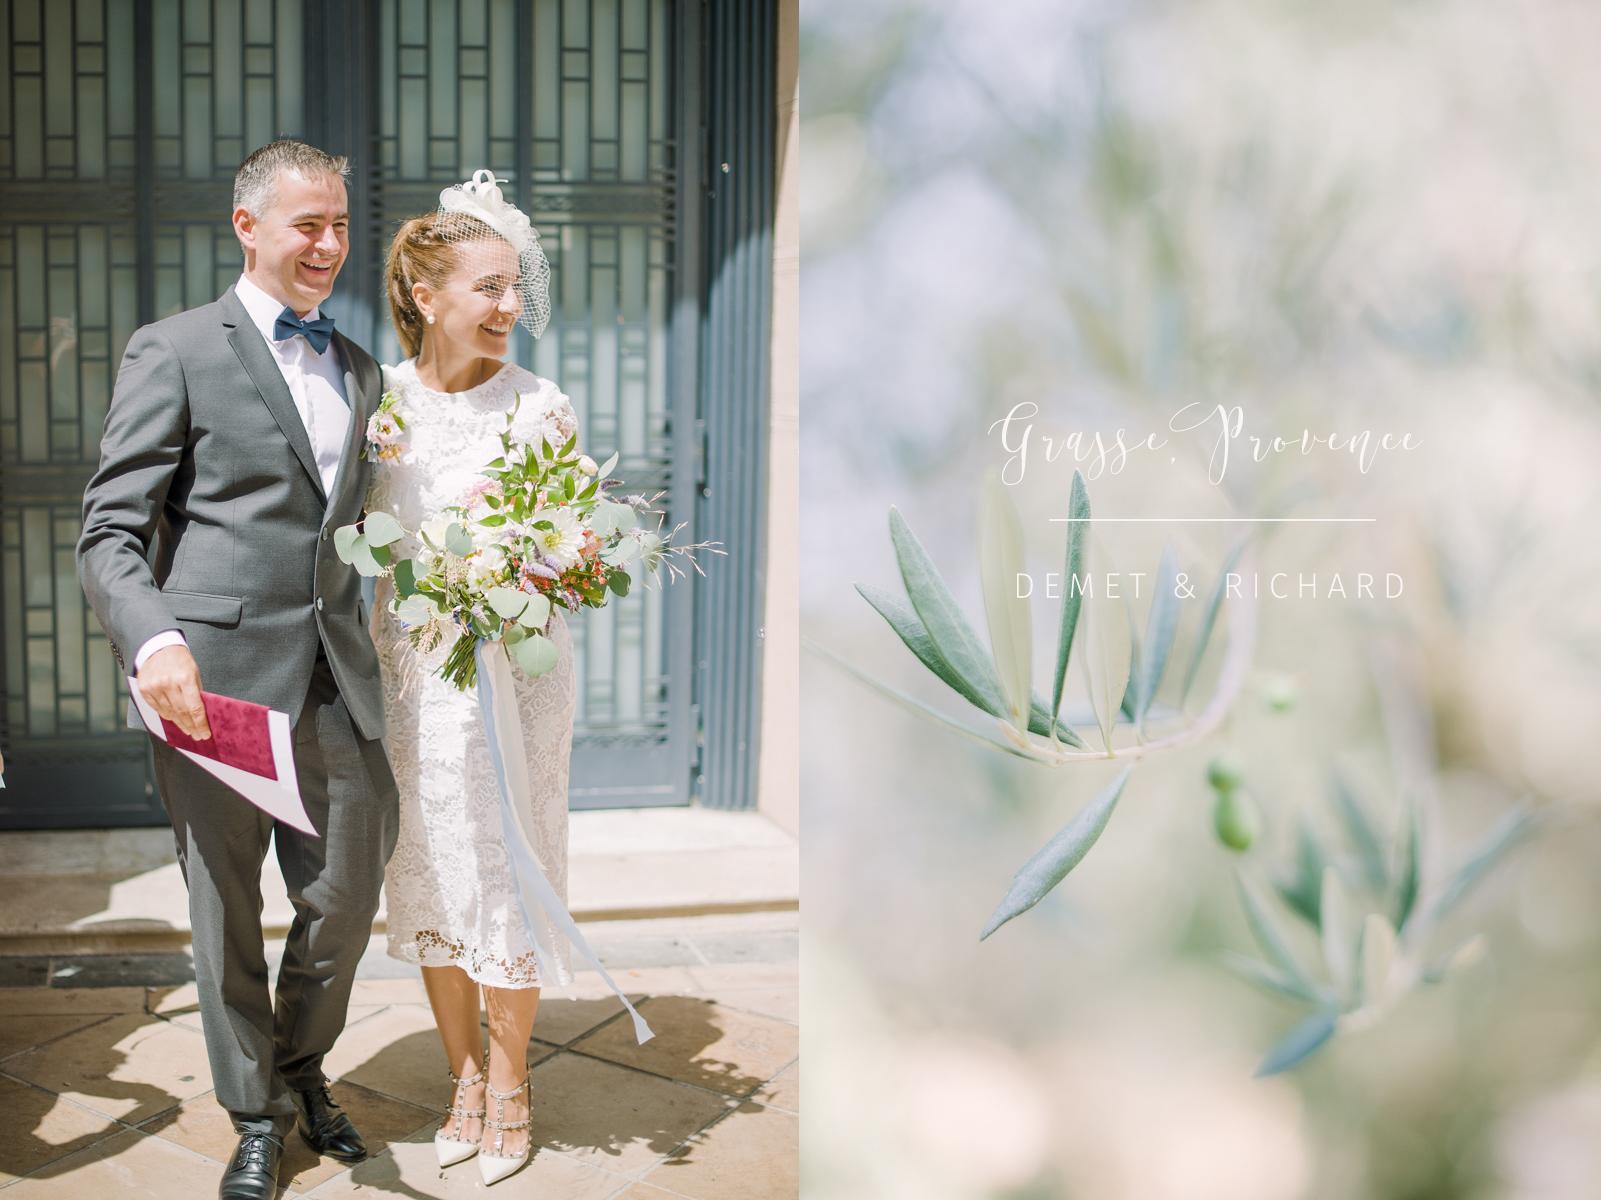 Boheme-Moon-Photography-Provence-wedding-photographer_00.jpg